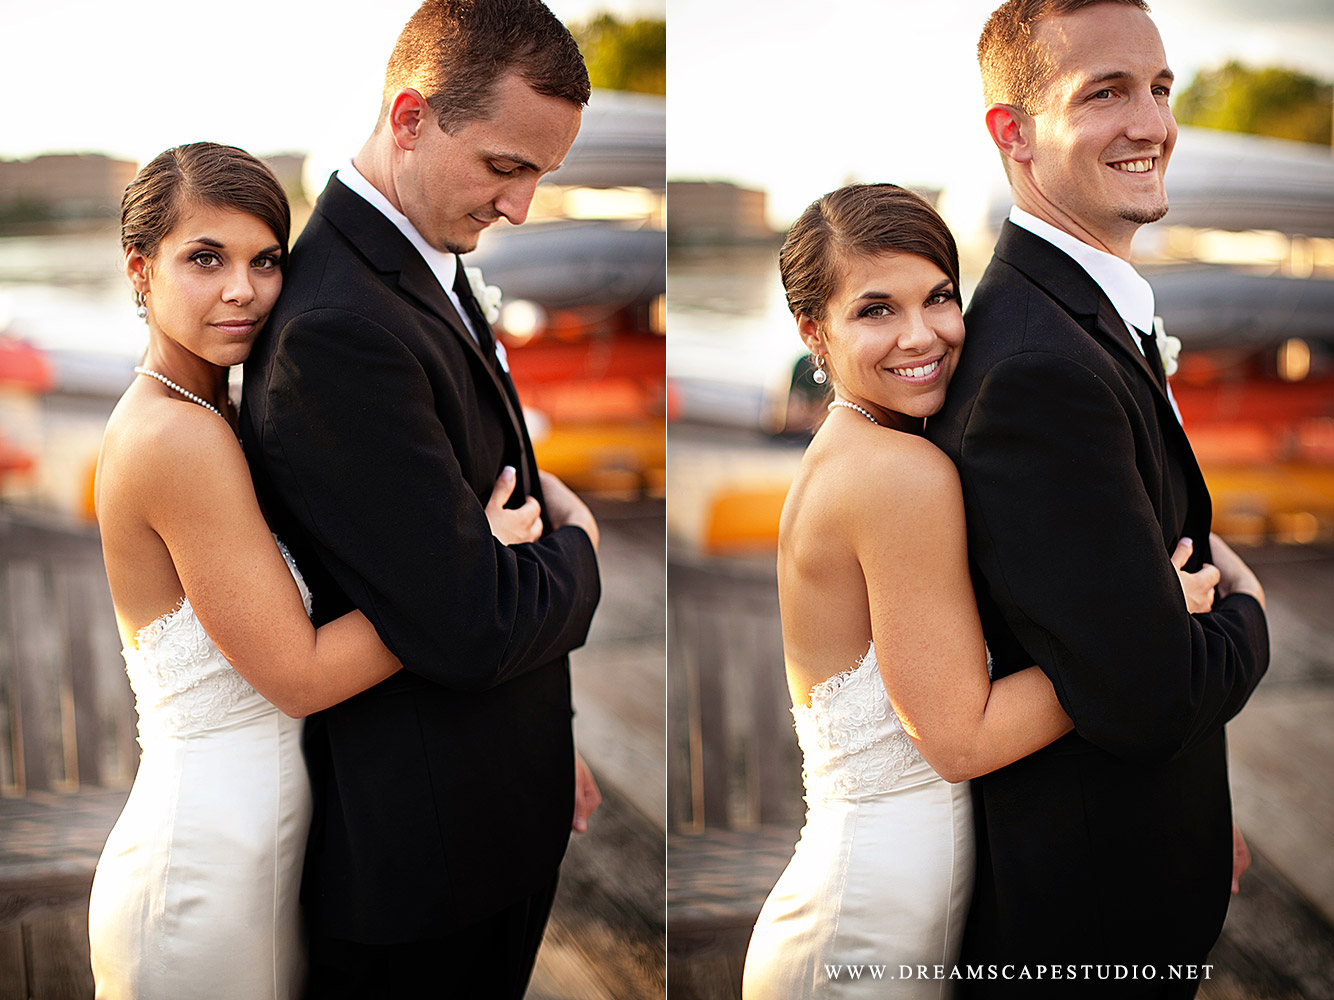 CT_Wedding_Photography_Liz_Justin_32LiJu.jpg